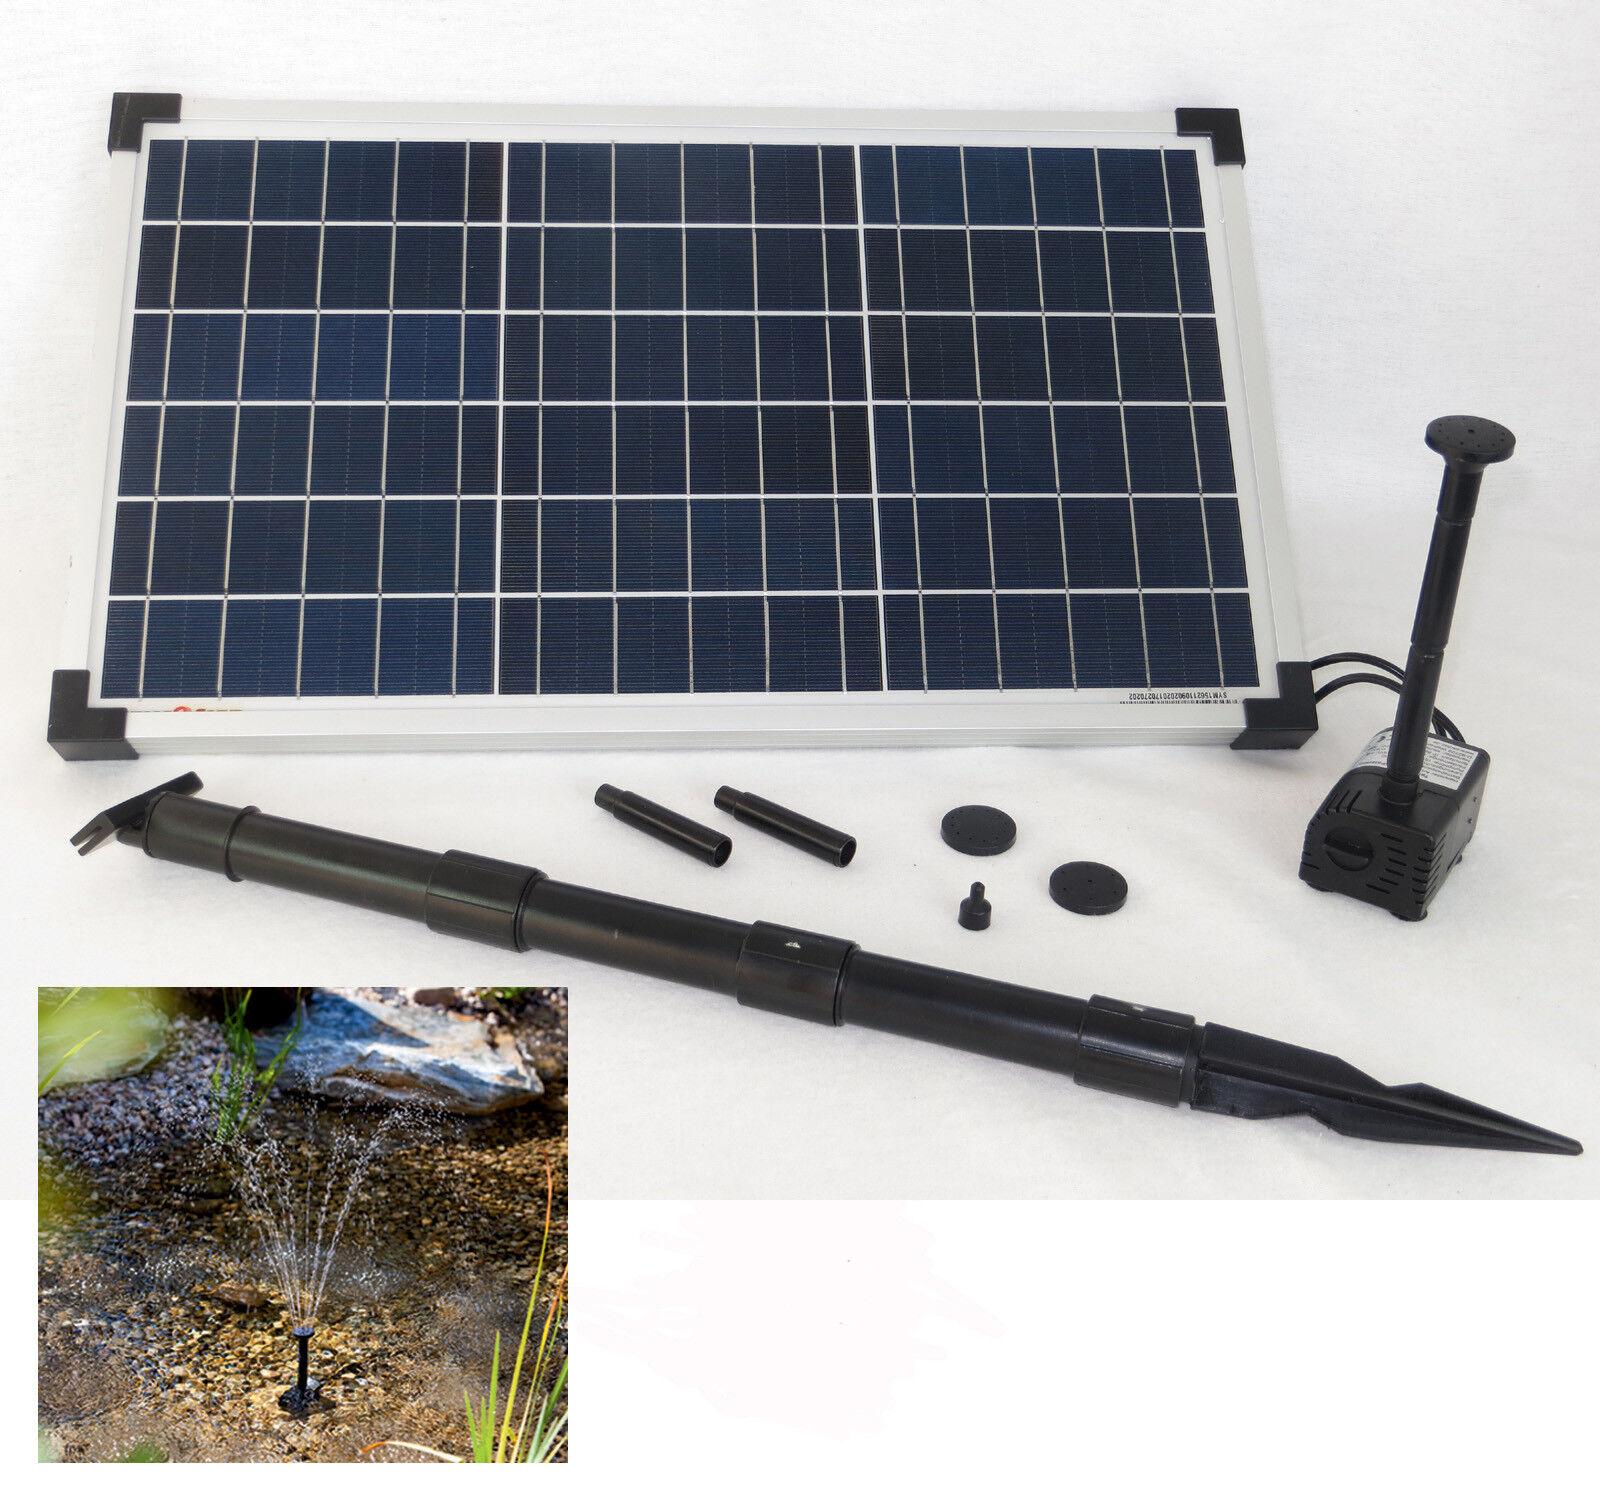 20 W bomba solar solar de jardín bomba estanque bomba estanque bomba jardín surtidor nuevo